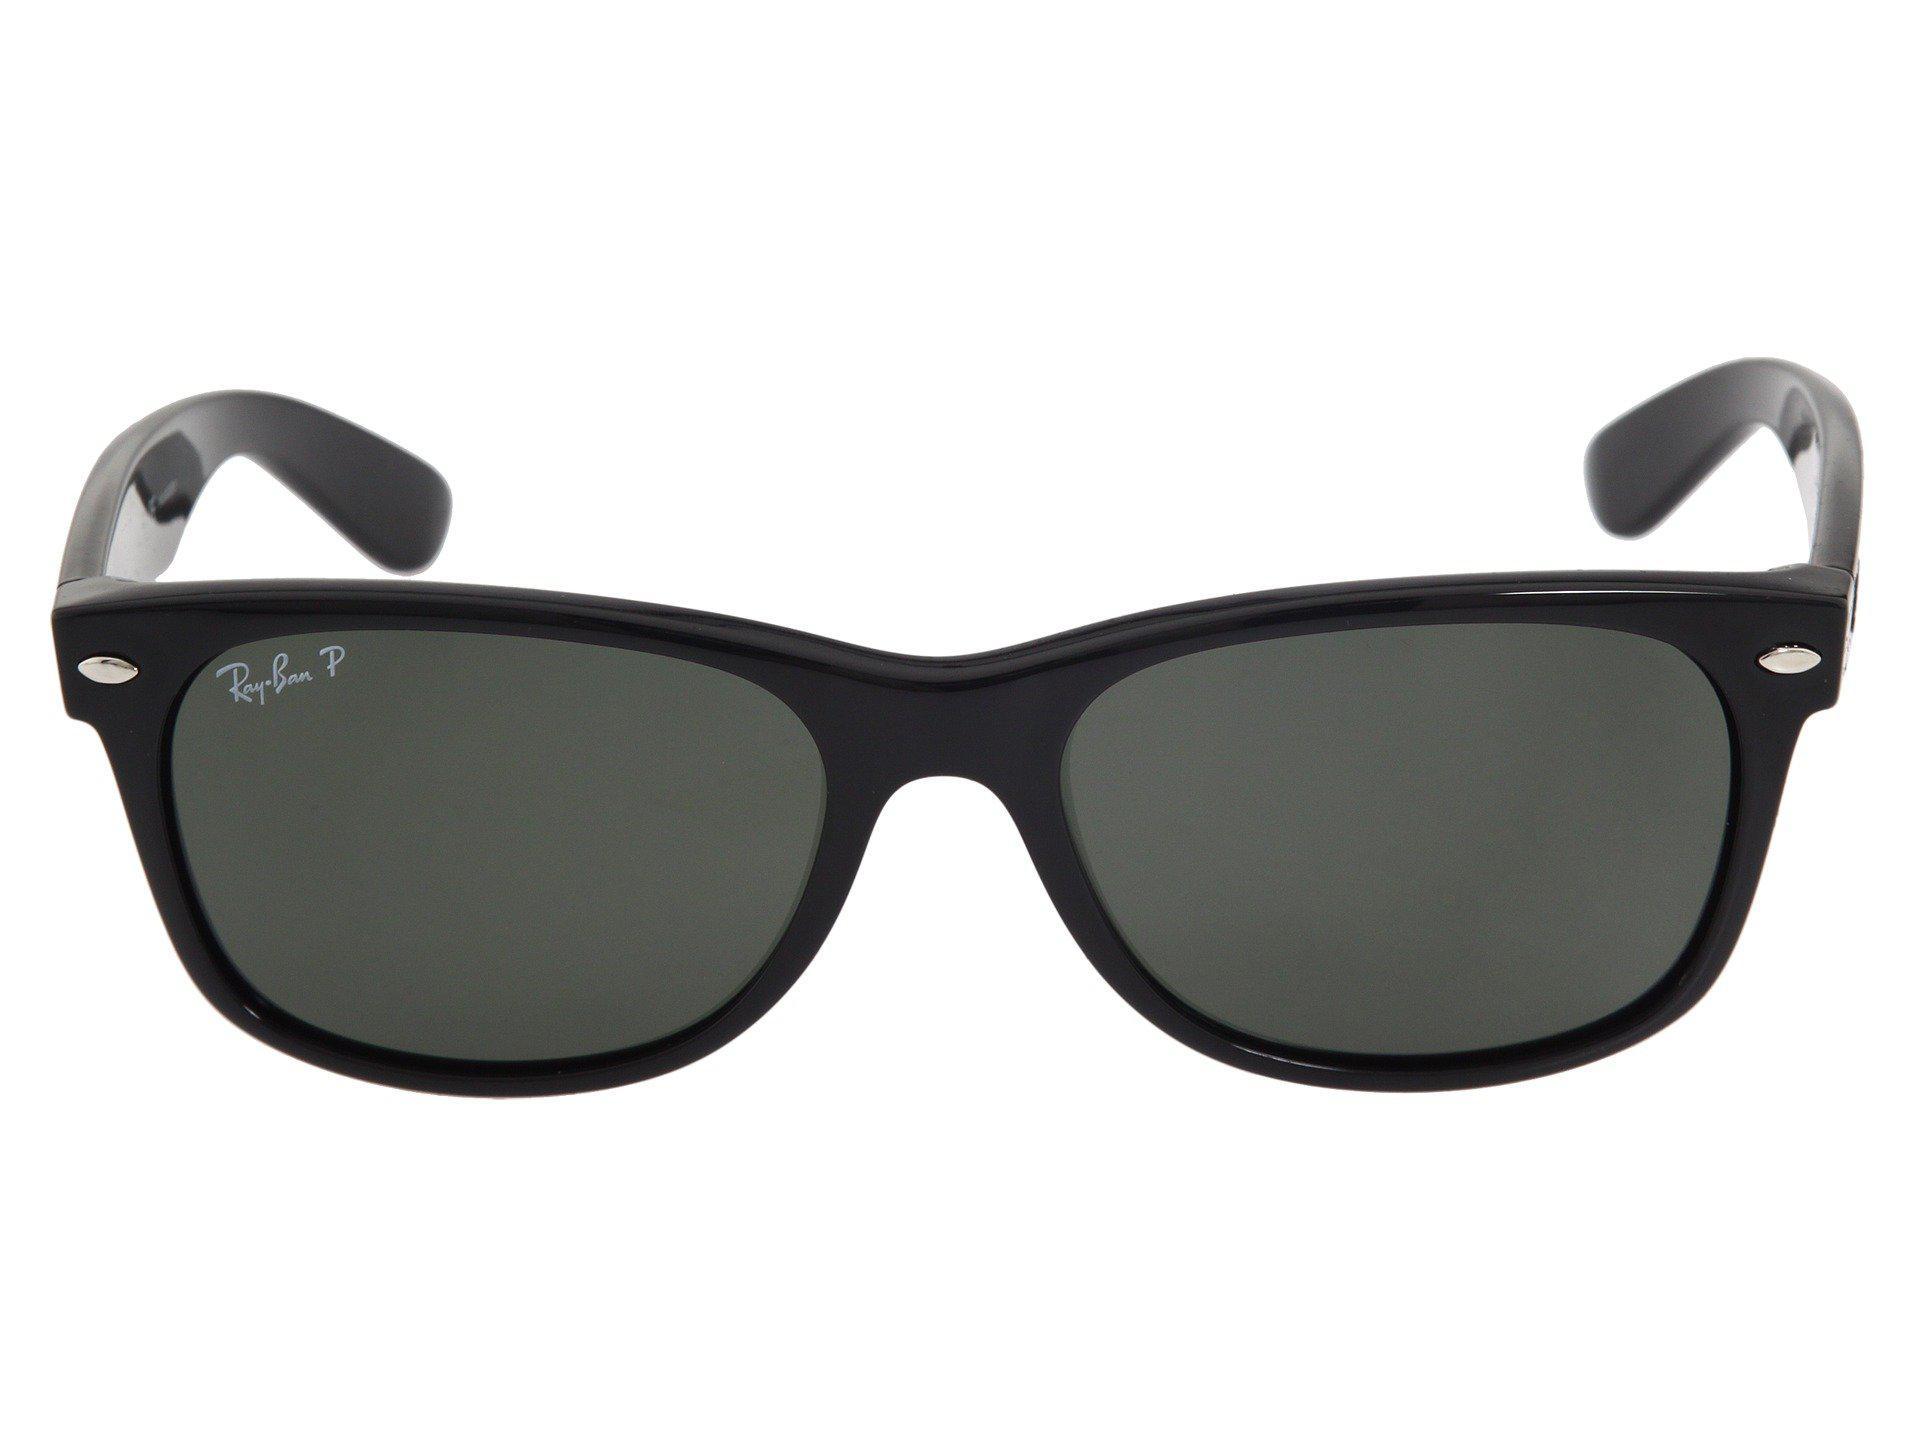 c0a6f54a8c2 Ray-Ban - Black Rb2132 New Wayfarer Polarized 55mm (tortoise crystal Green  Polarized. View fullscreen